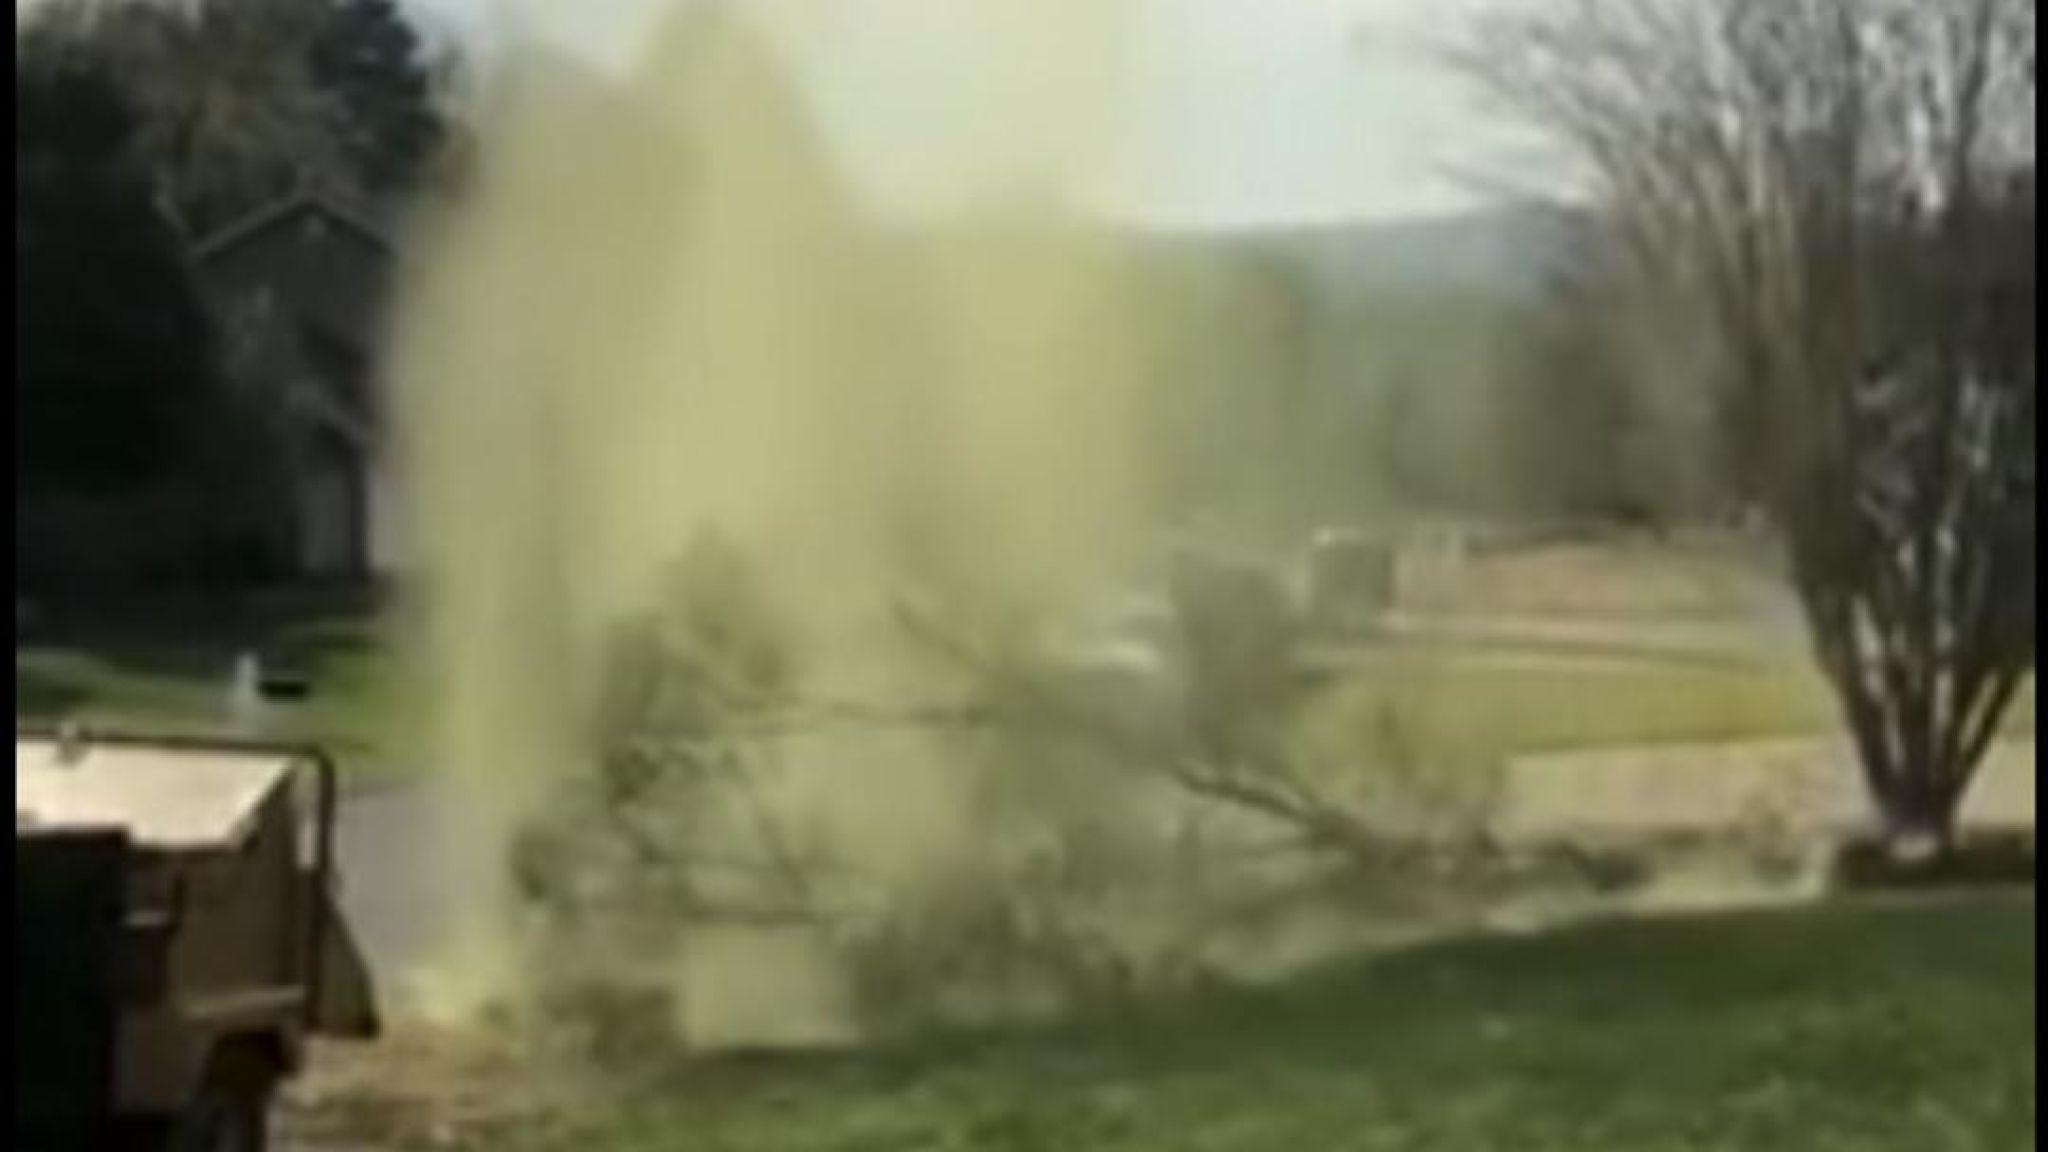 Tem alergias? Vídeo mostra nuvem de pólen a emanar de árvore caída